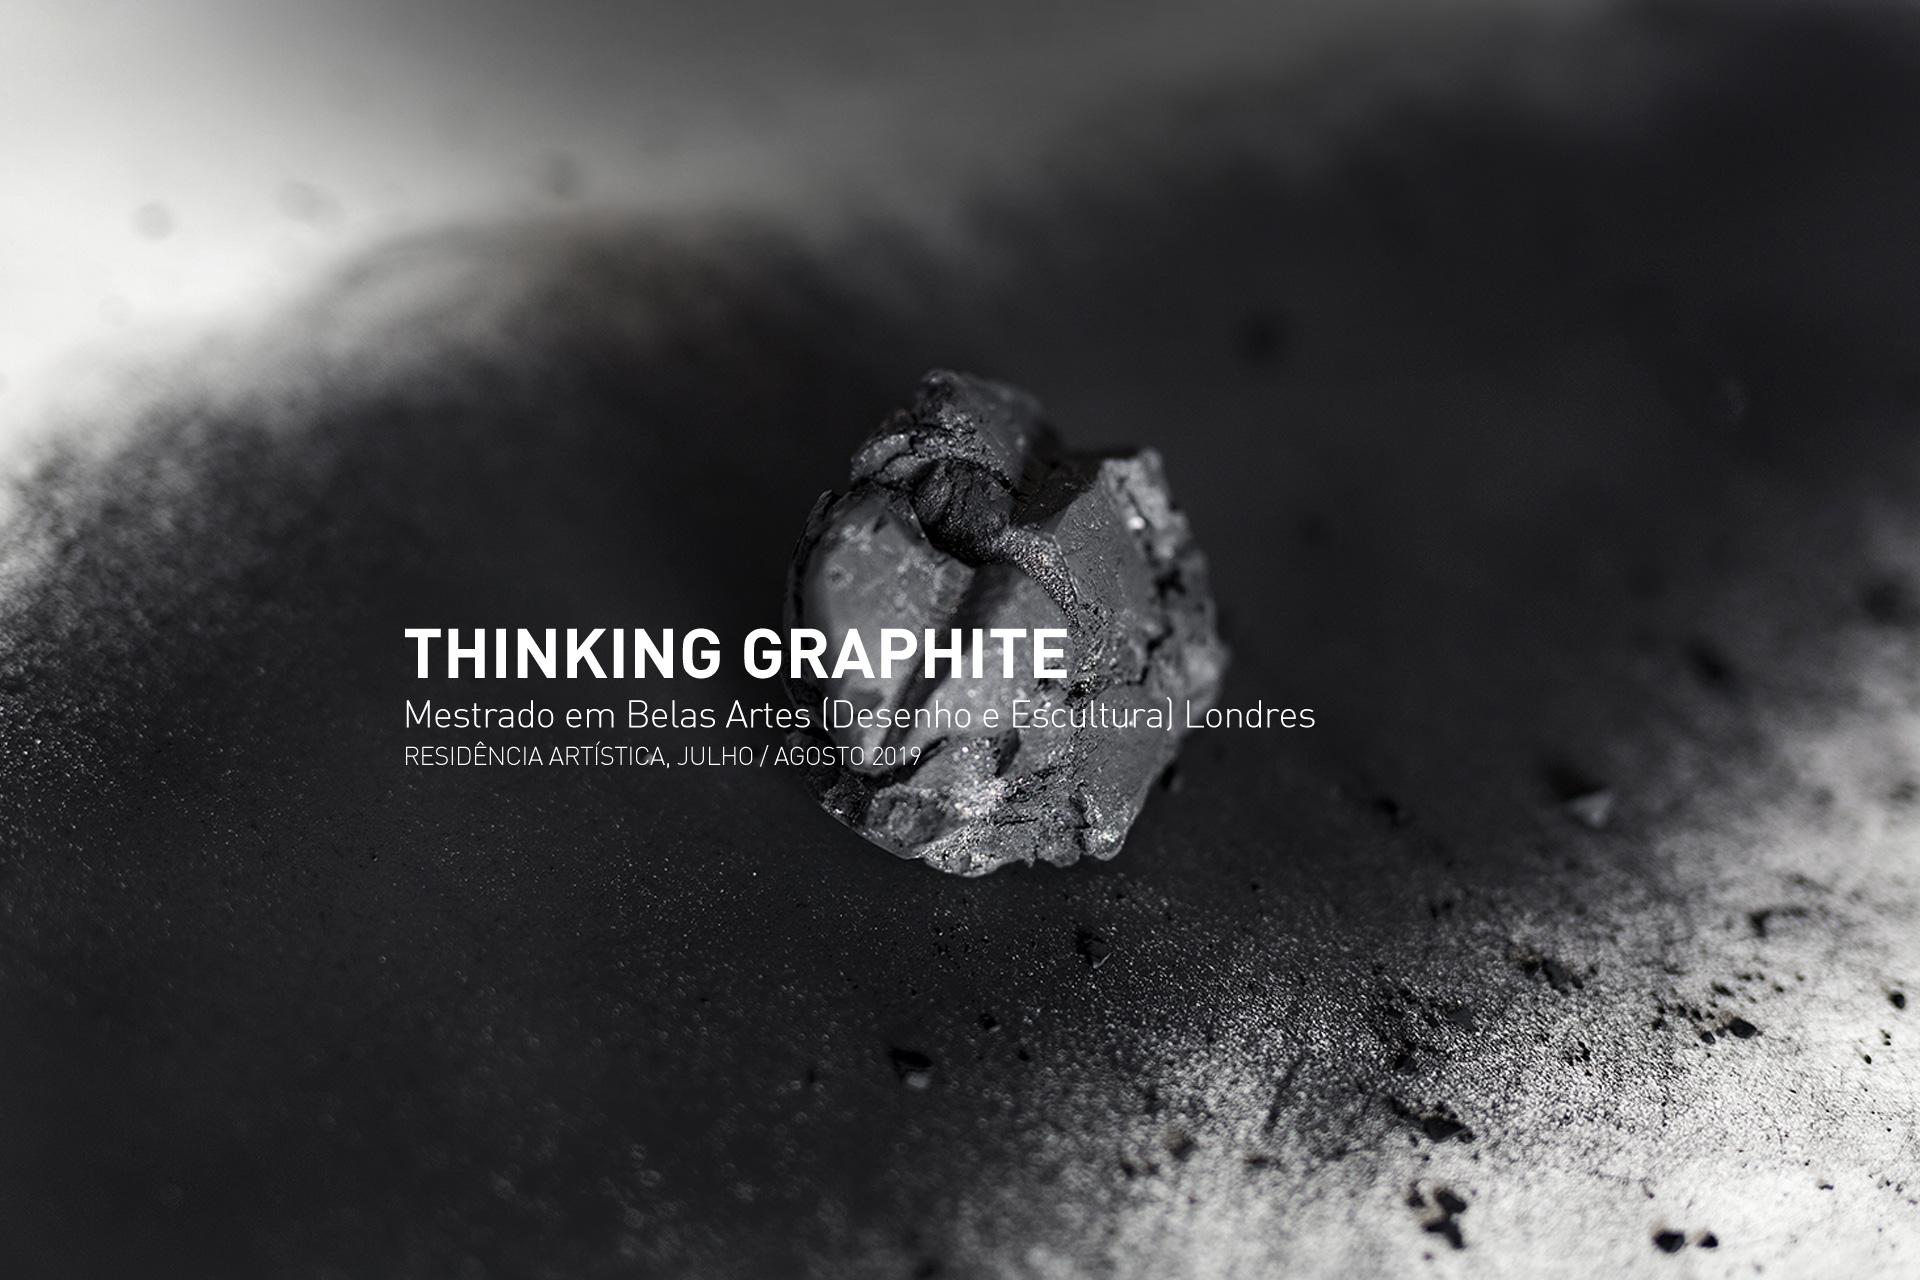 Thinking Graphite